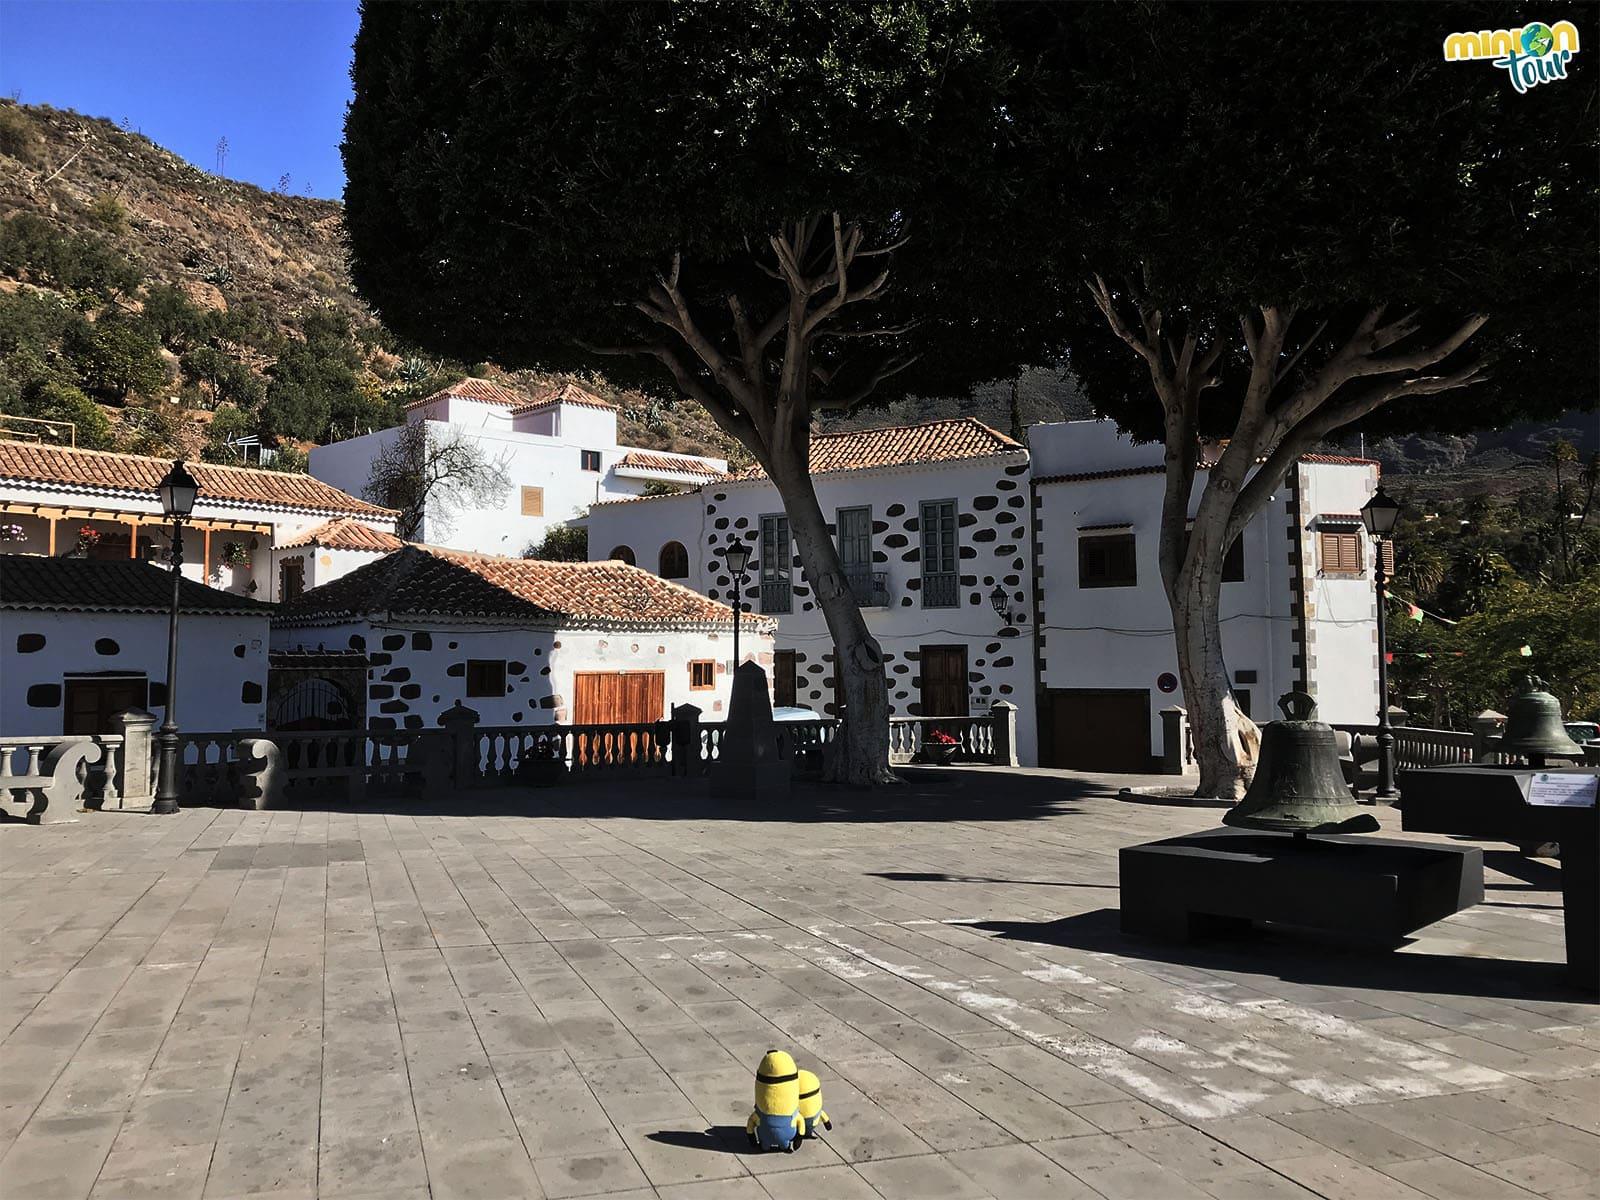 Casas típicas de Gran Canaria